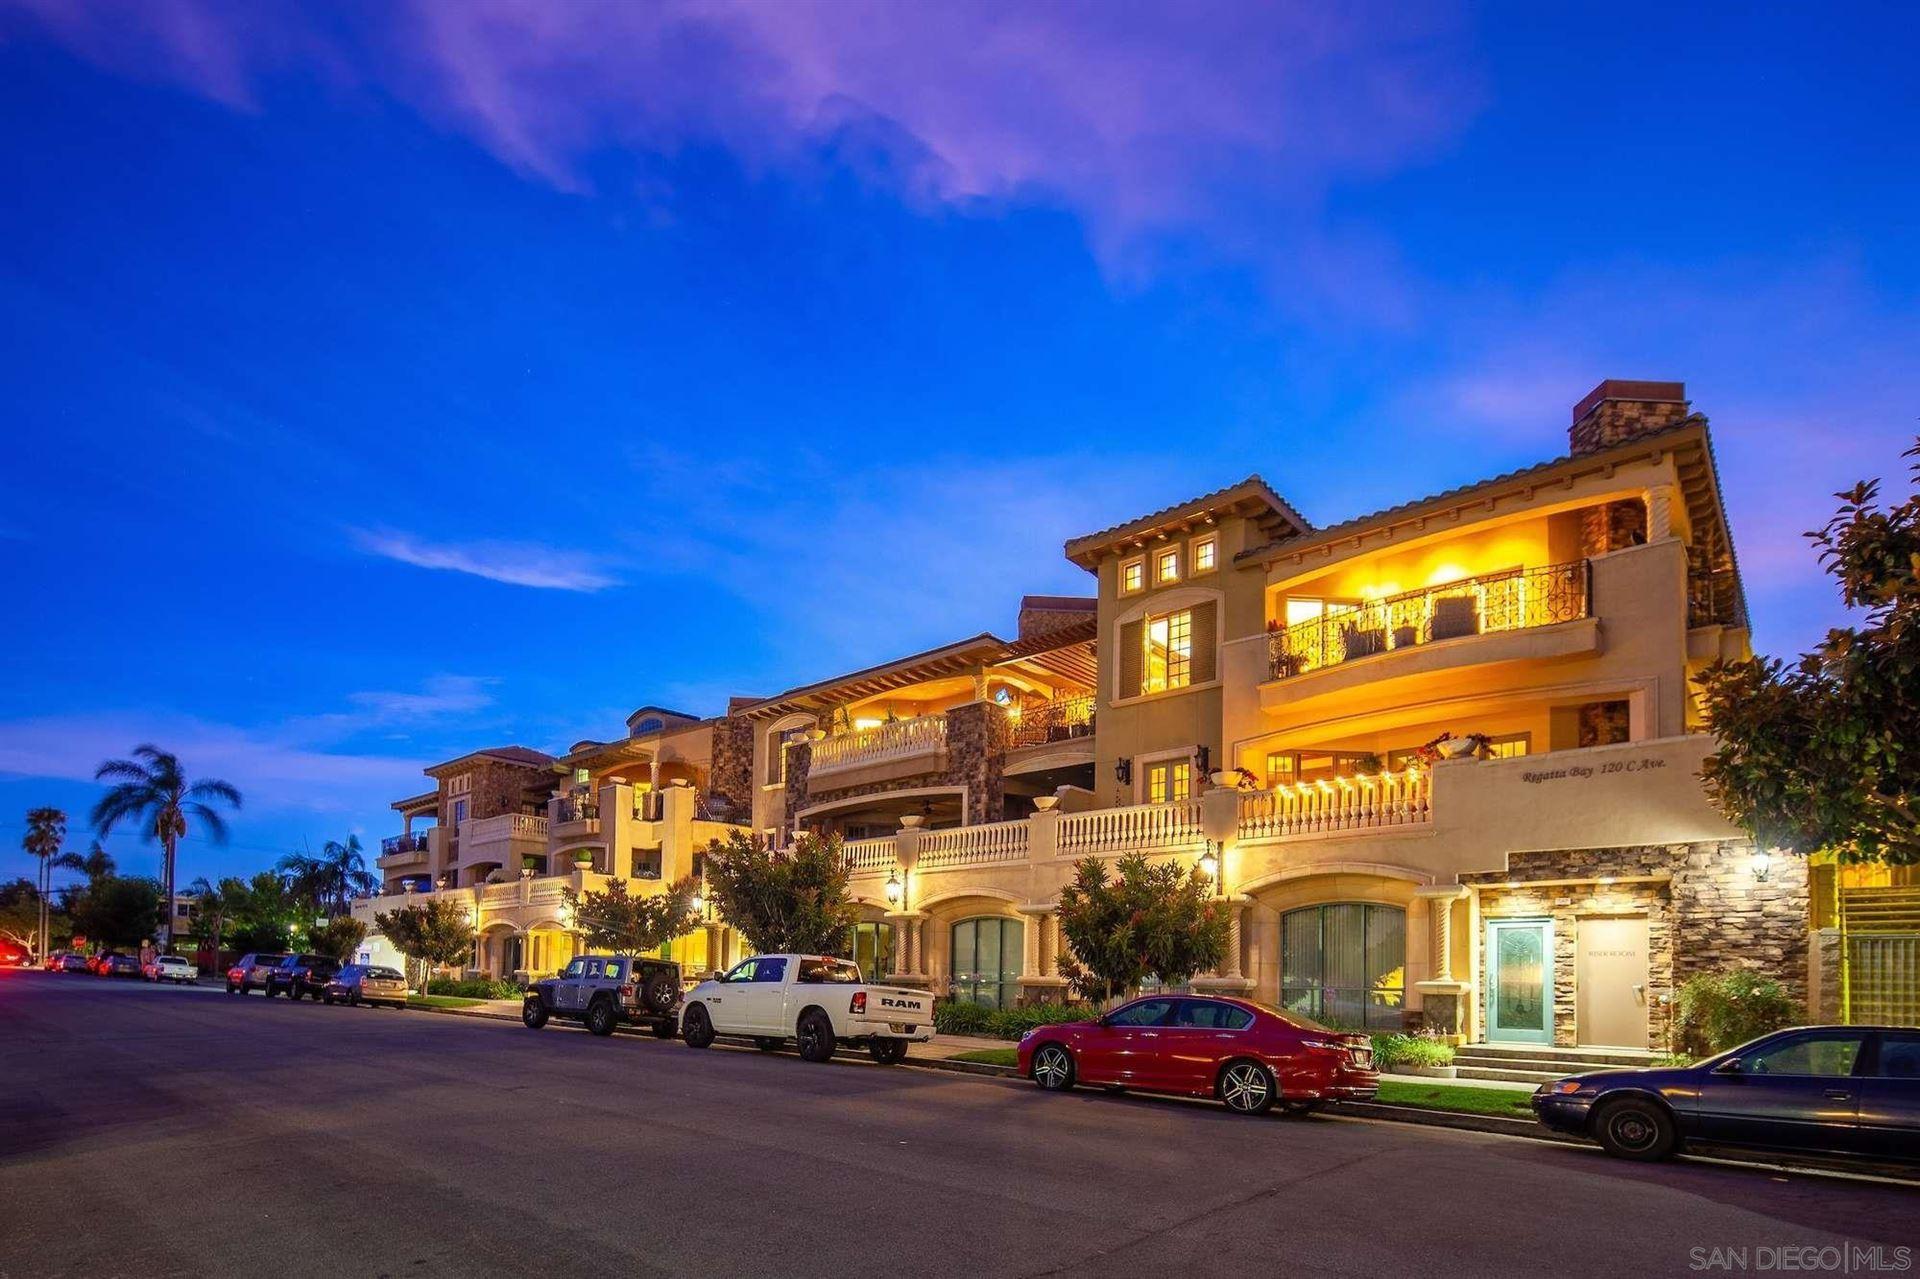 Photo of 120 C Ave #308, Coronado, CA 92118 (MLS # 210026263)